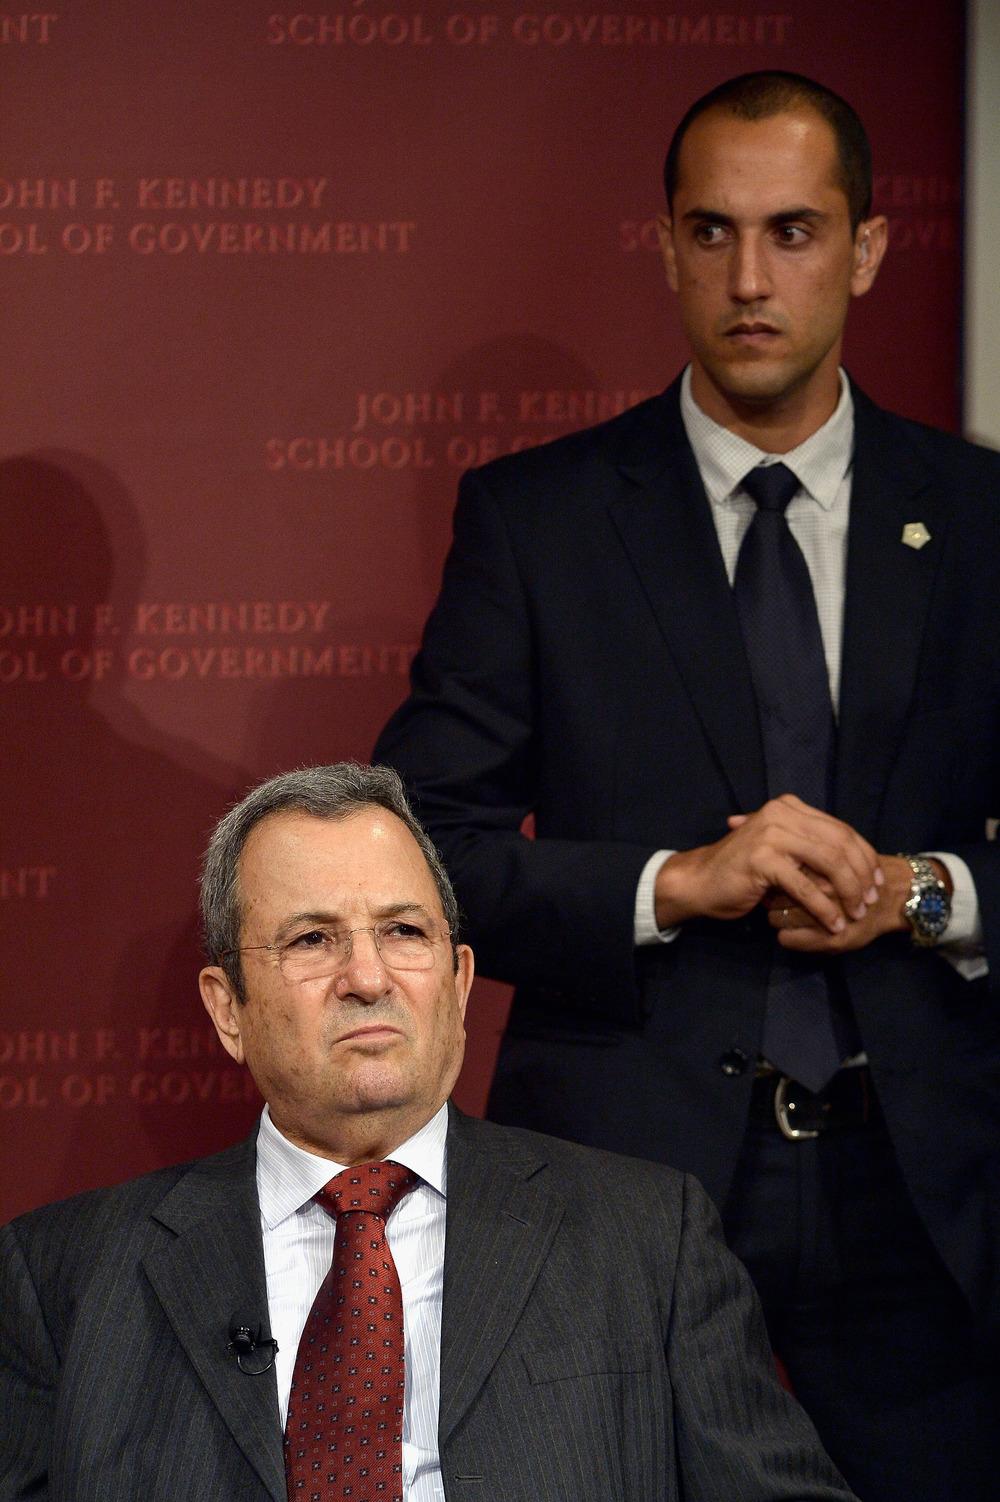 Ehud Barak at Harvard